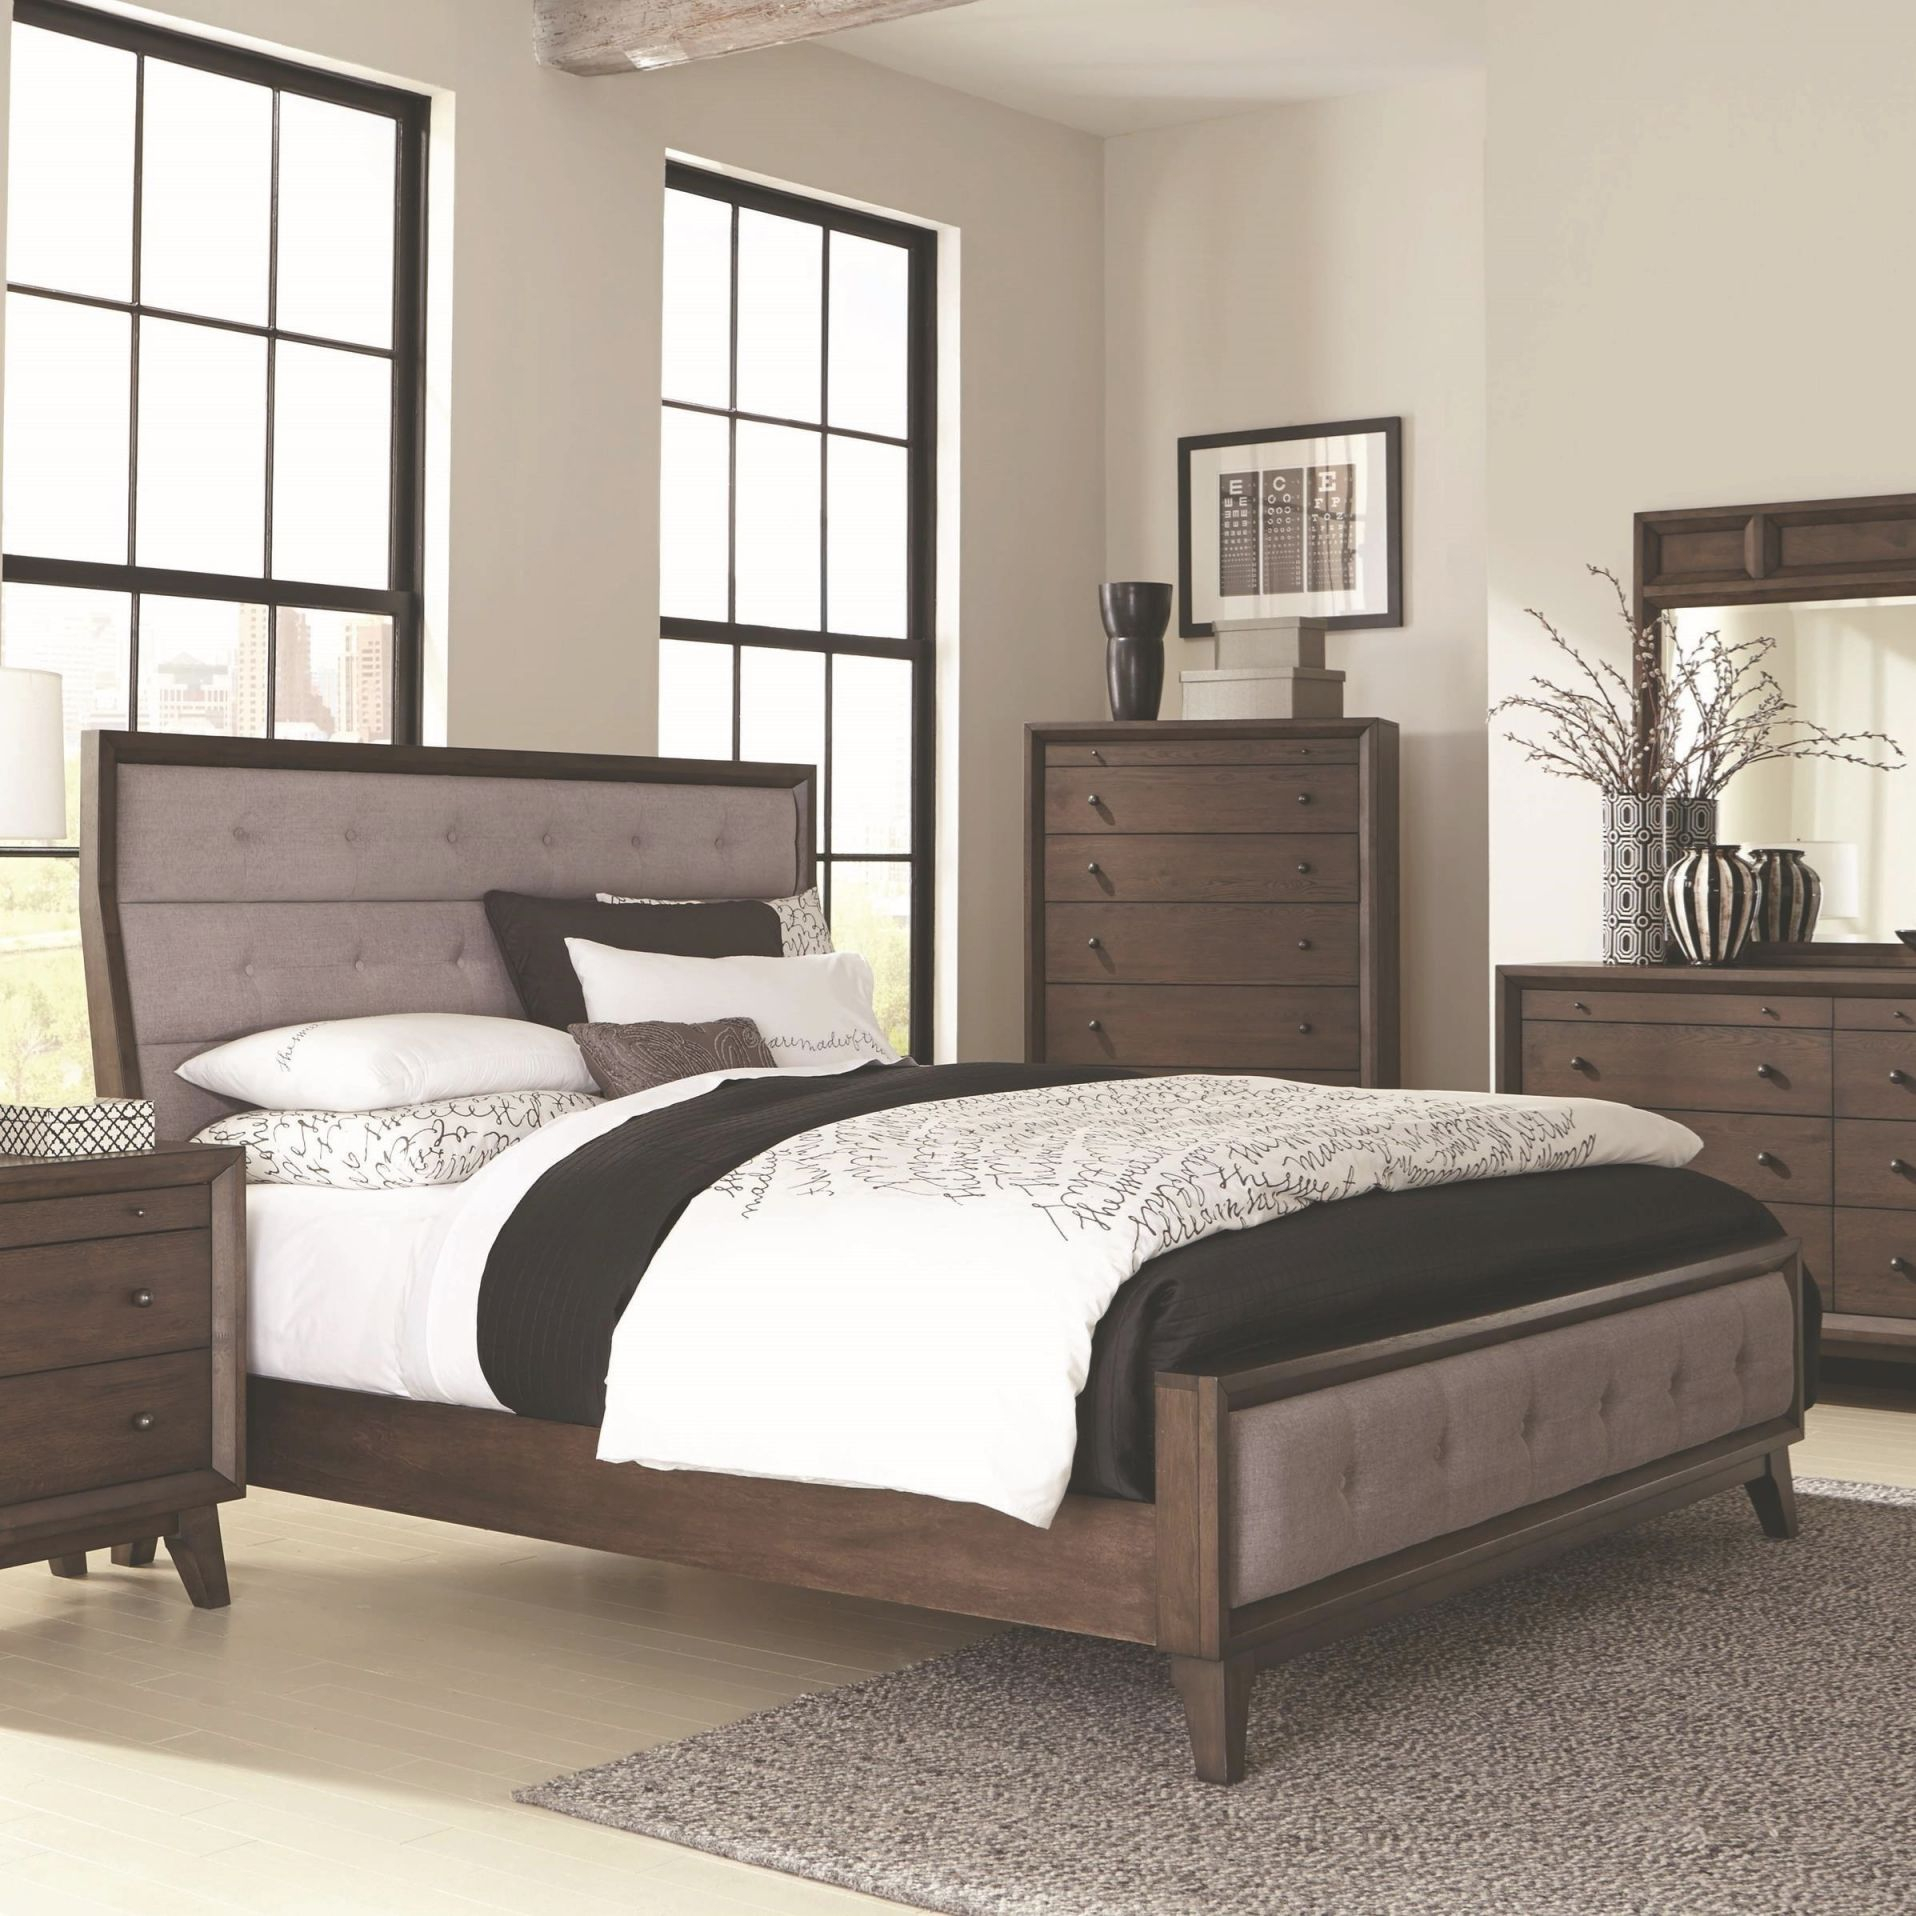 Bingham King Upholstered Bedcoaster At Northeast Factory Direct within Full Size Bedroom Furniture Sets